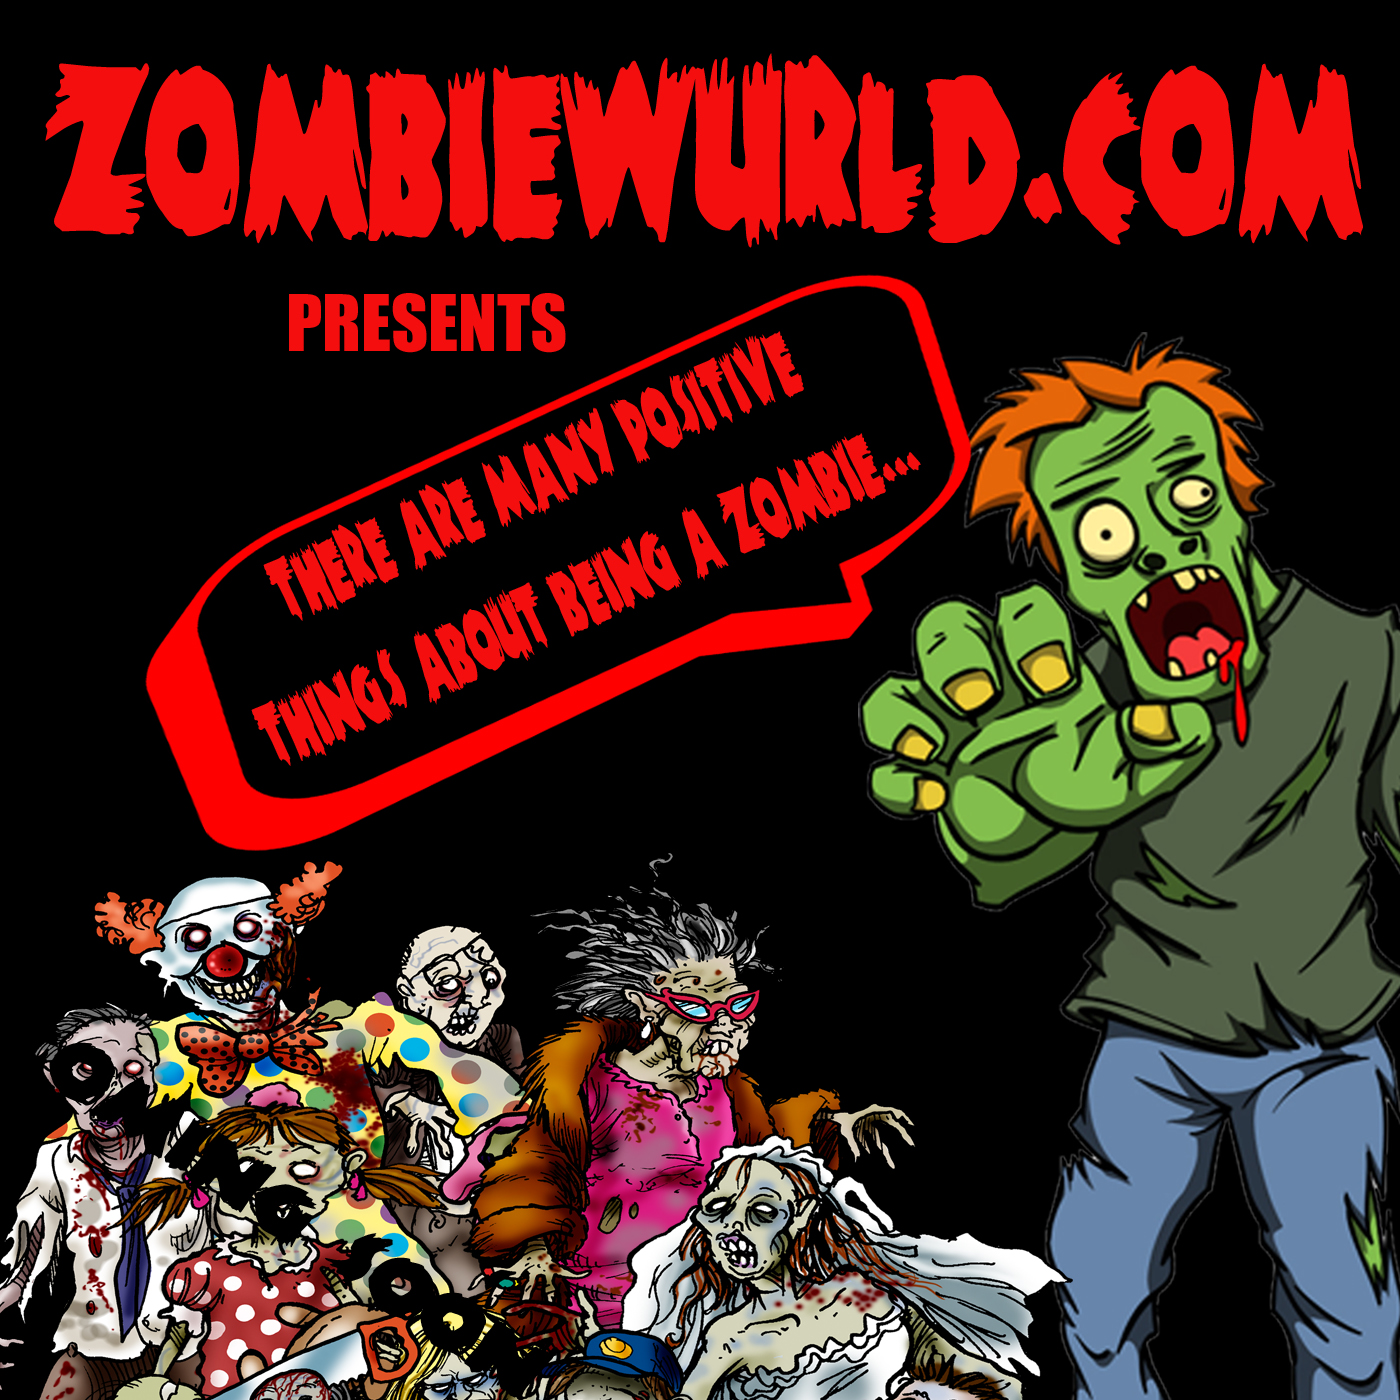 ZombieWurld